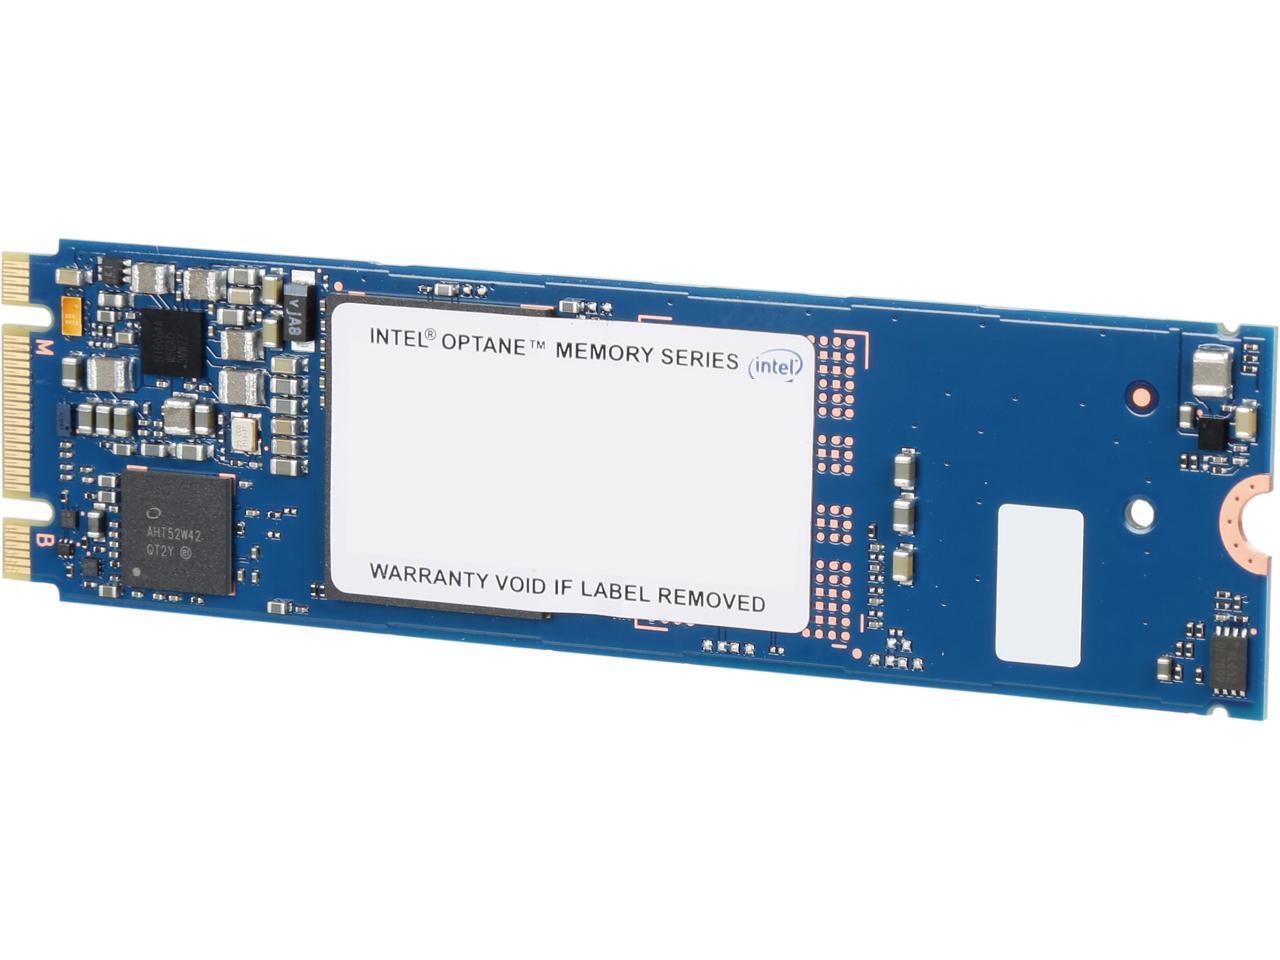 Intel Optane M2 2280 16gb Pcie Nvme 30 X2 Memory Module System Shaped Flash Light Lamp Electronic Circuit Board Production Suite Diy Accelerator Mempek1w016gaxt